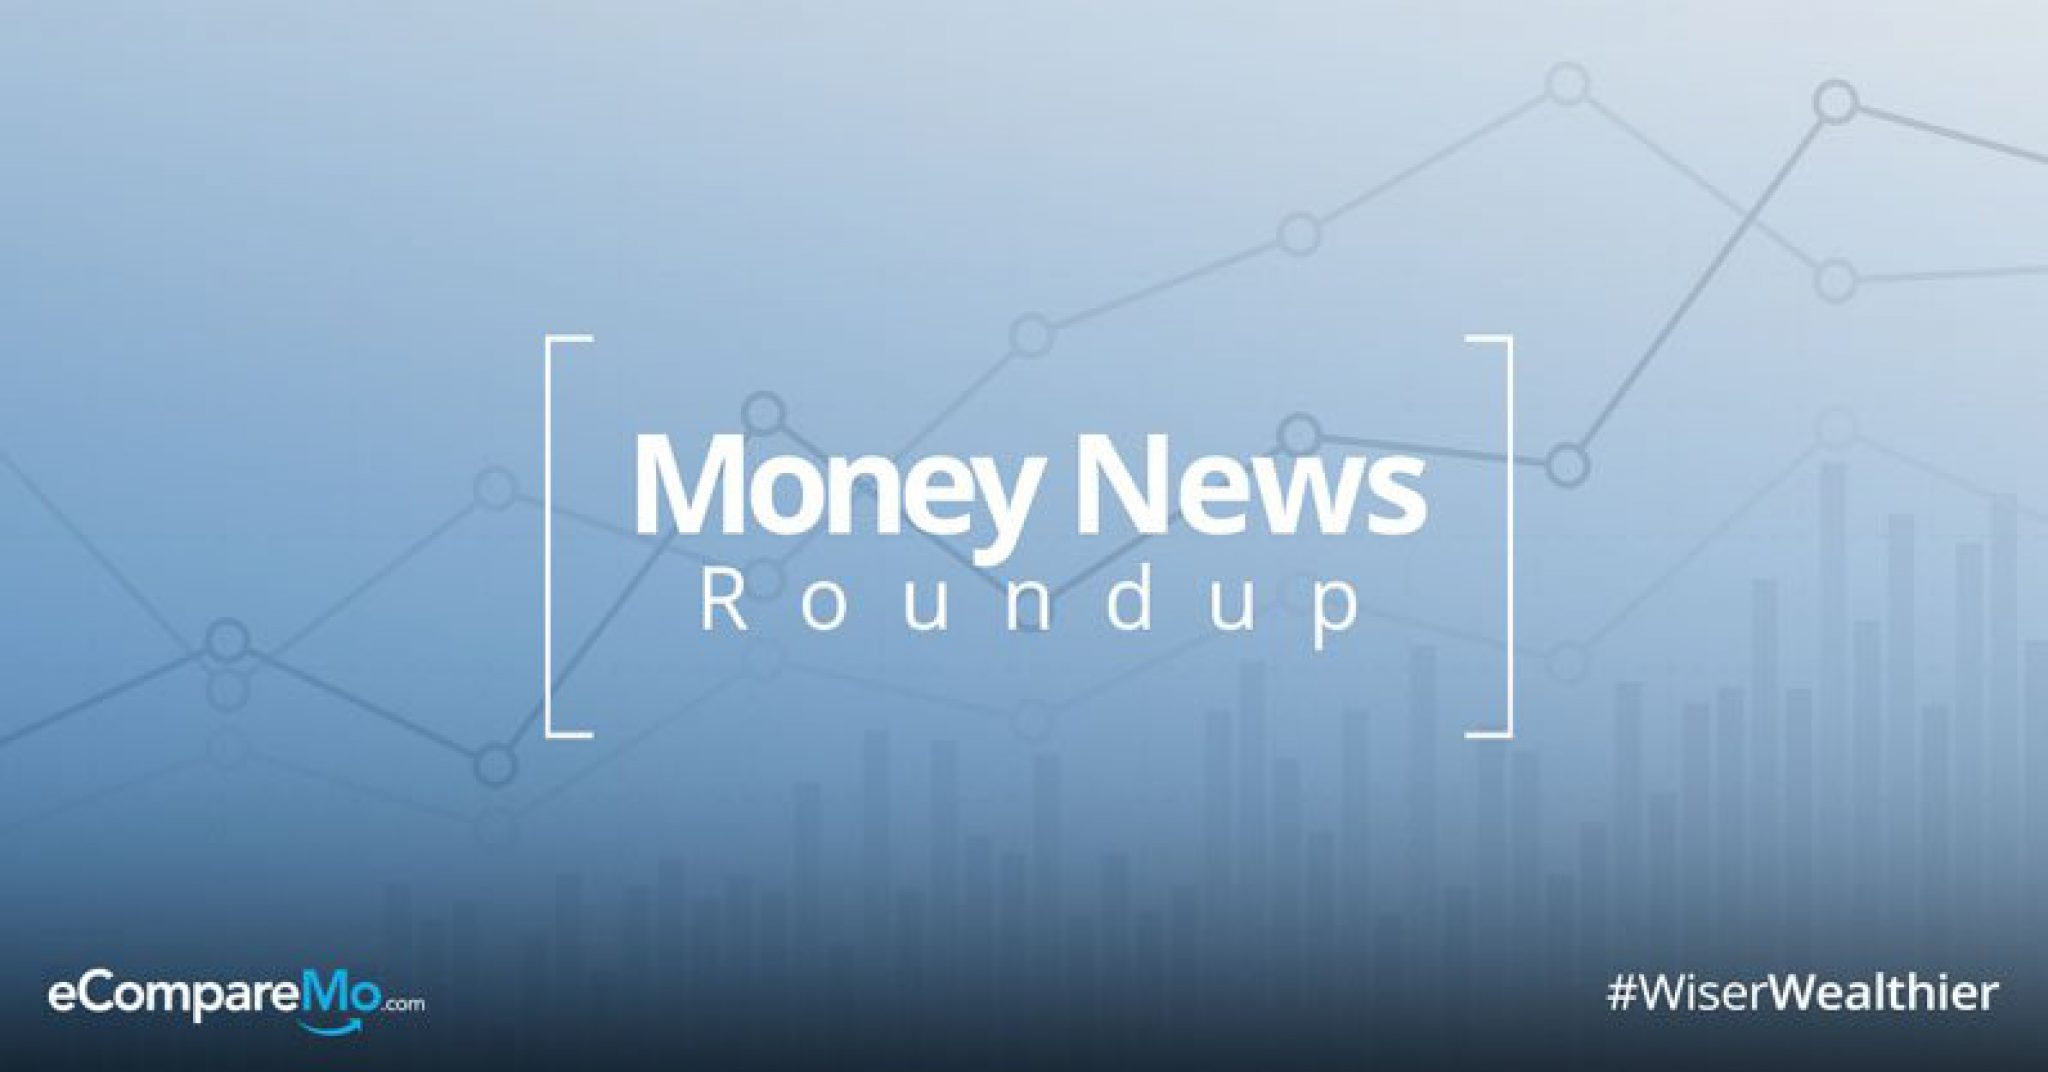 Money News Roundup